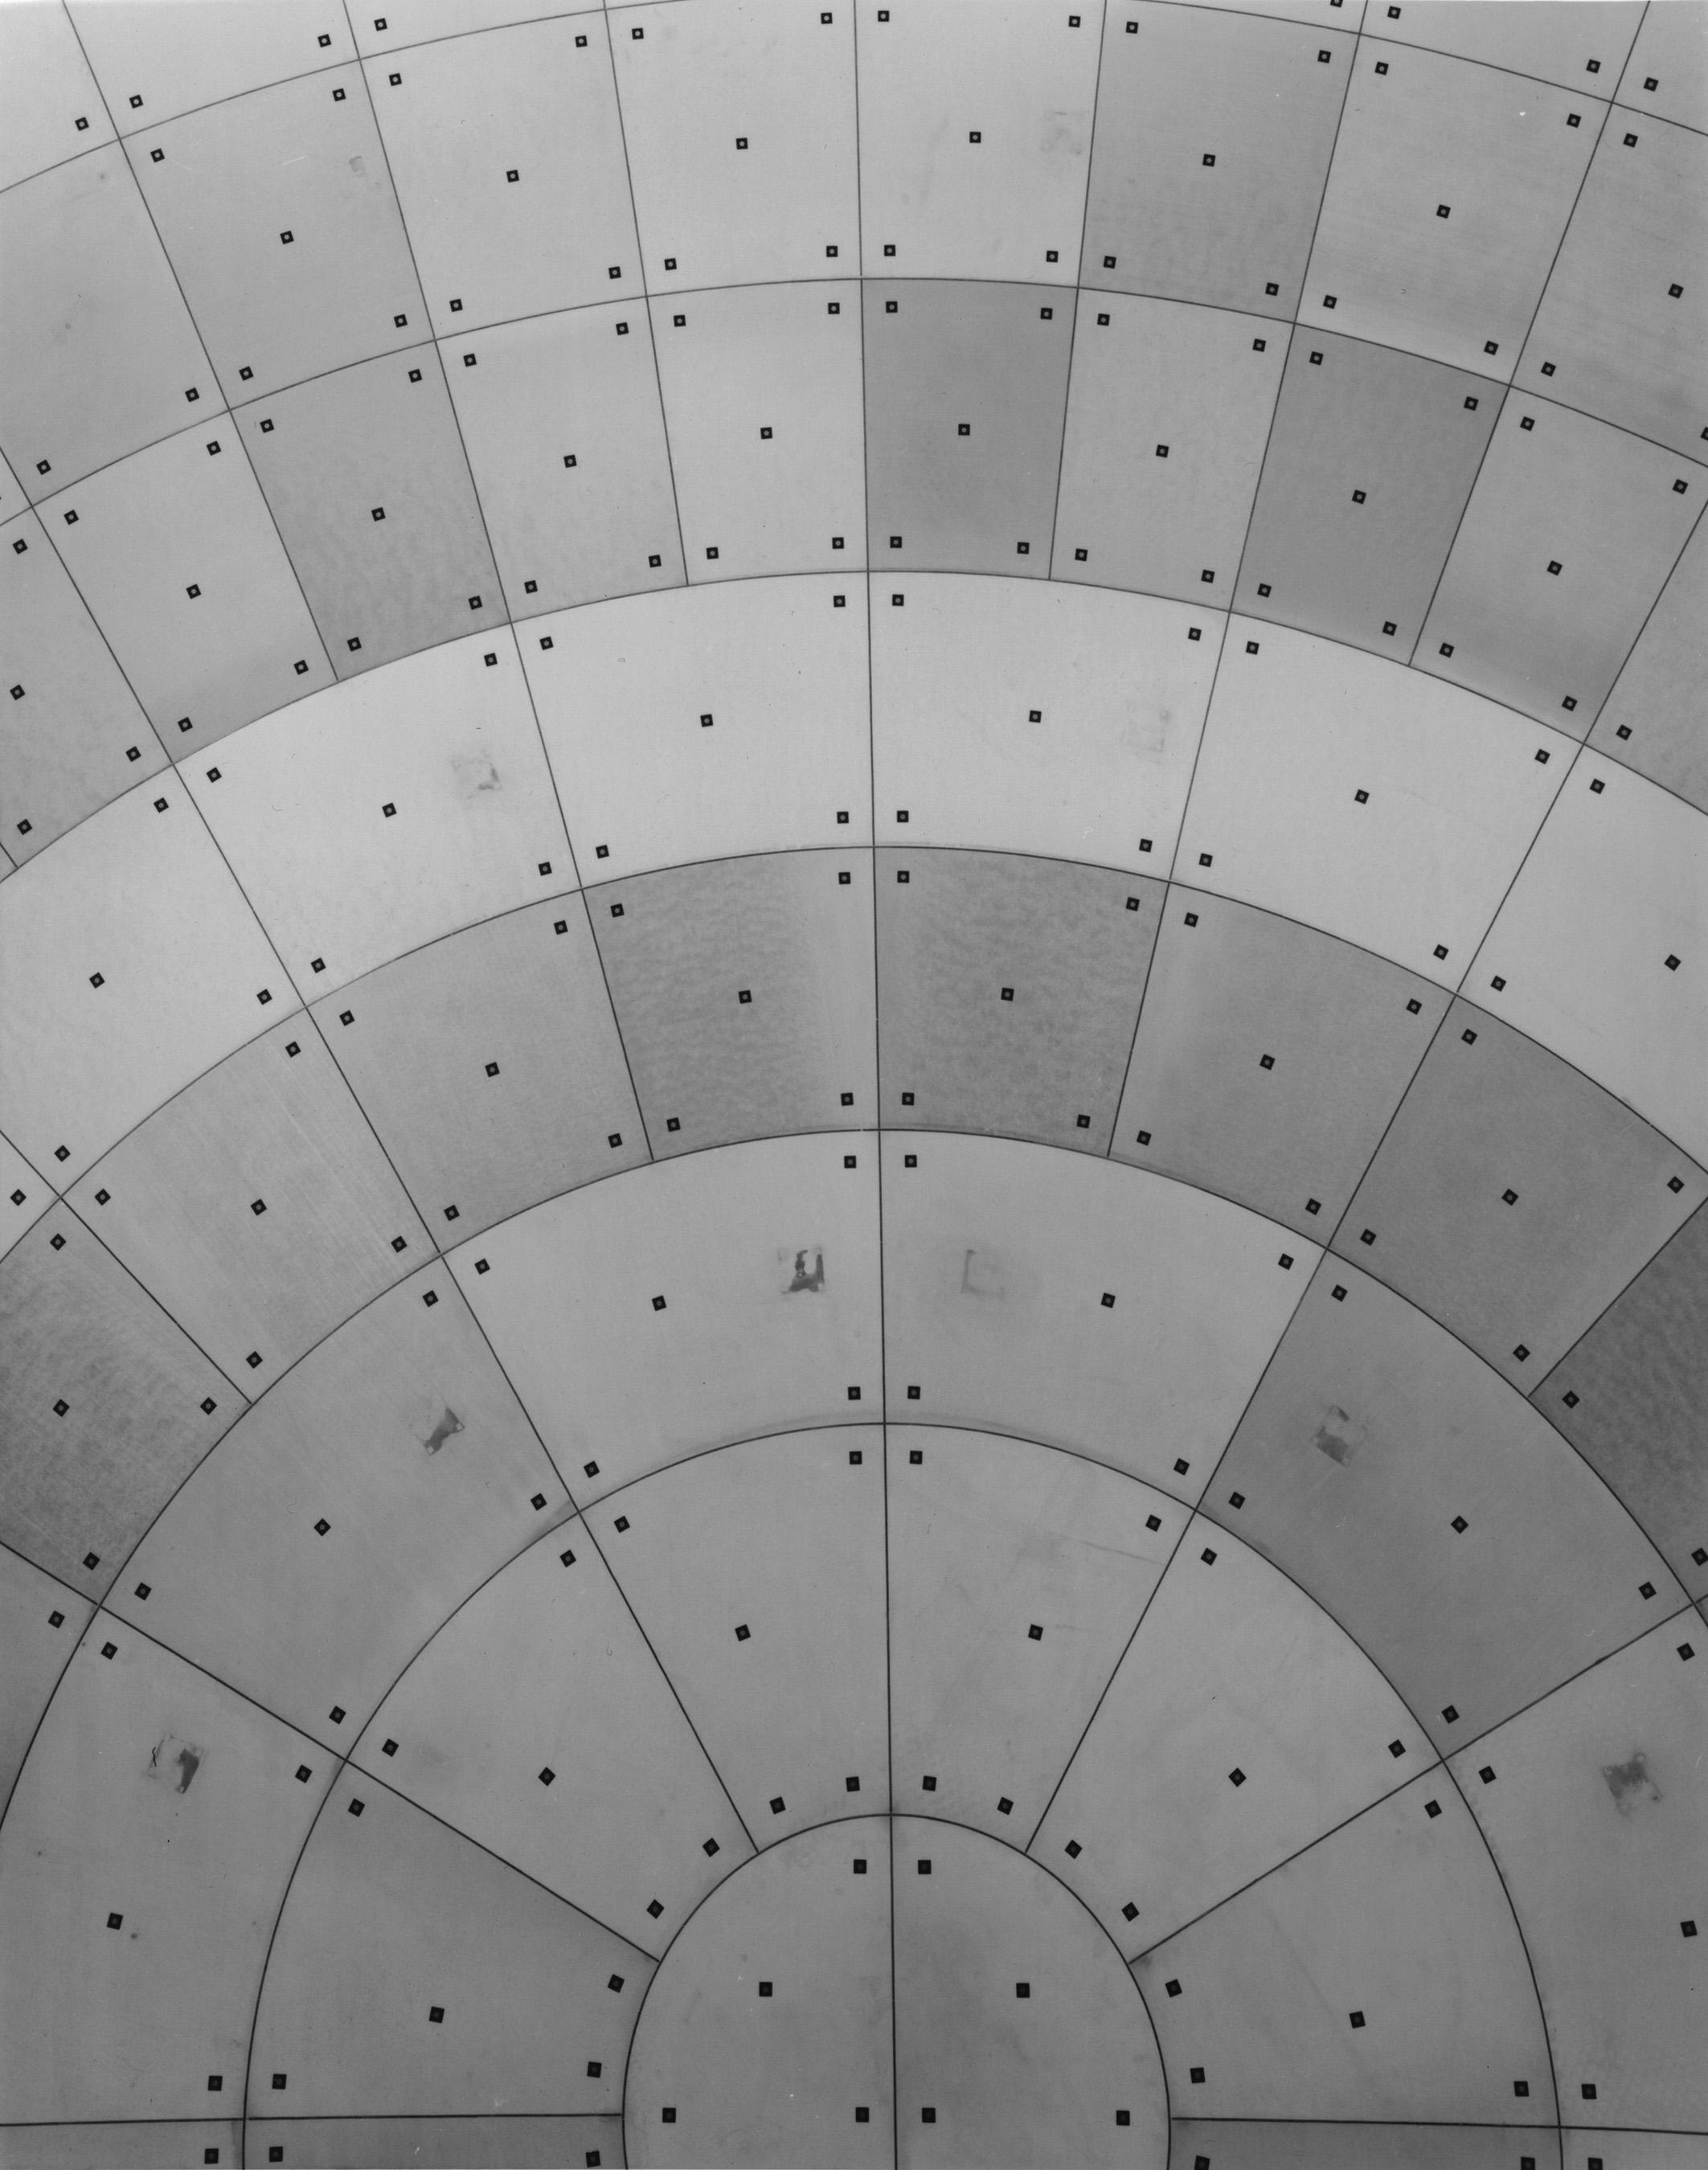 South Pole Telescope, 2011